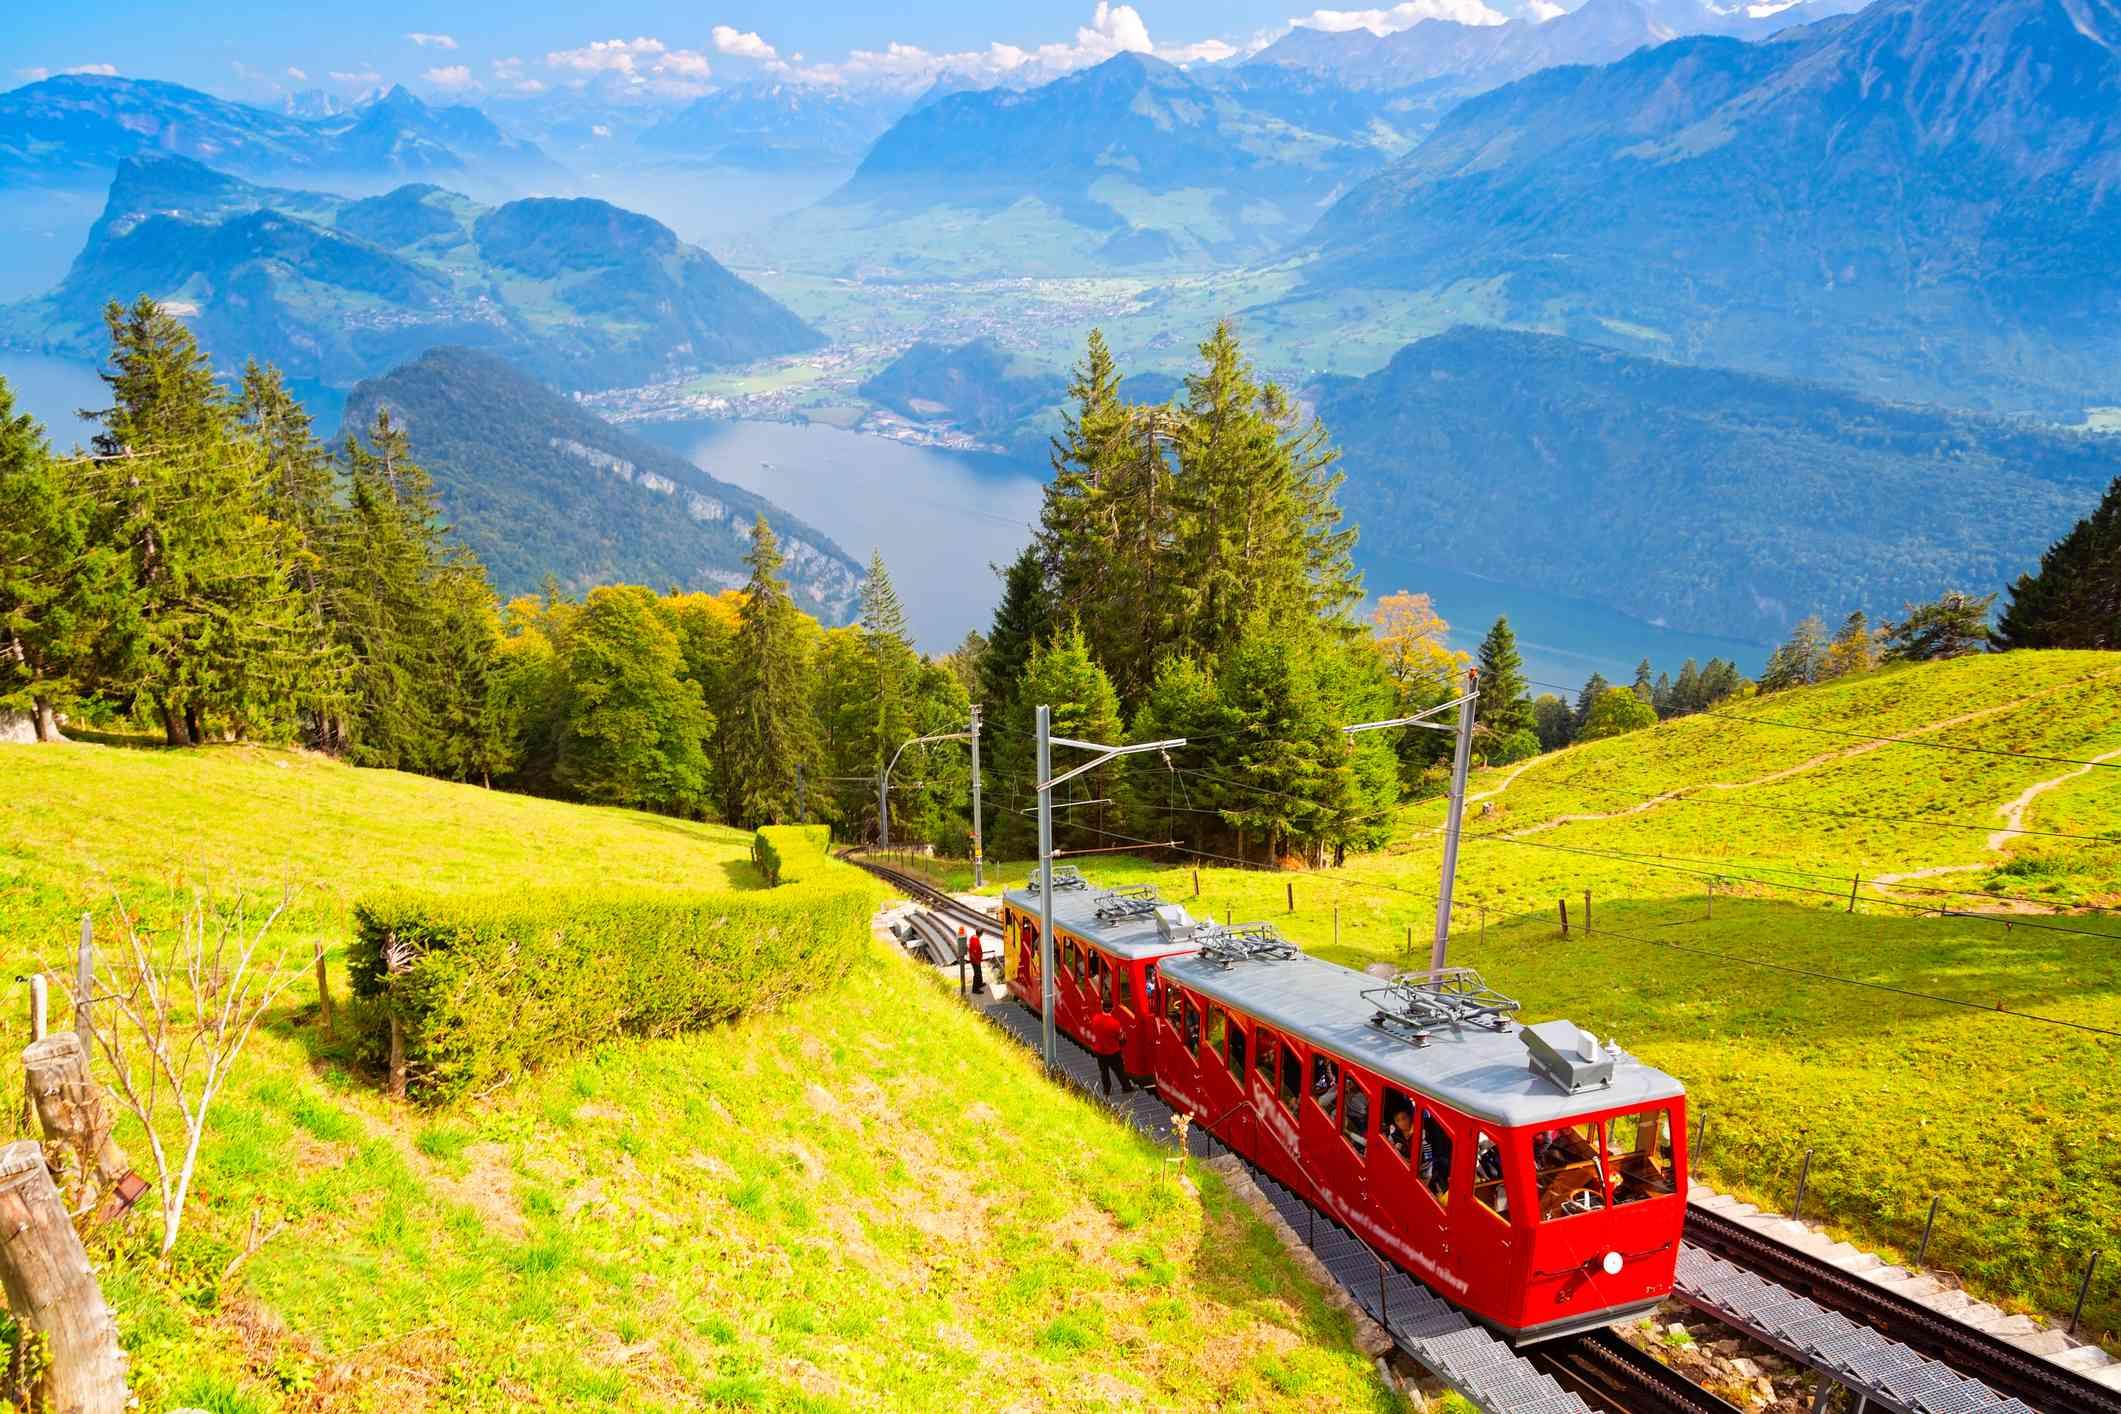 Bright red cogwheel train climbs up Mount Pilatus